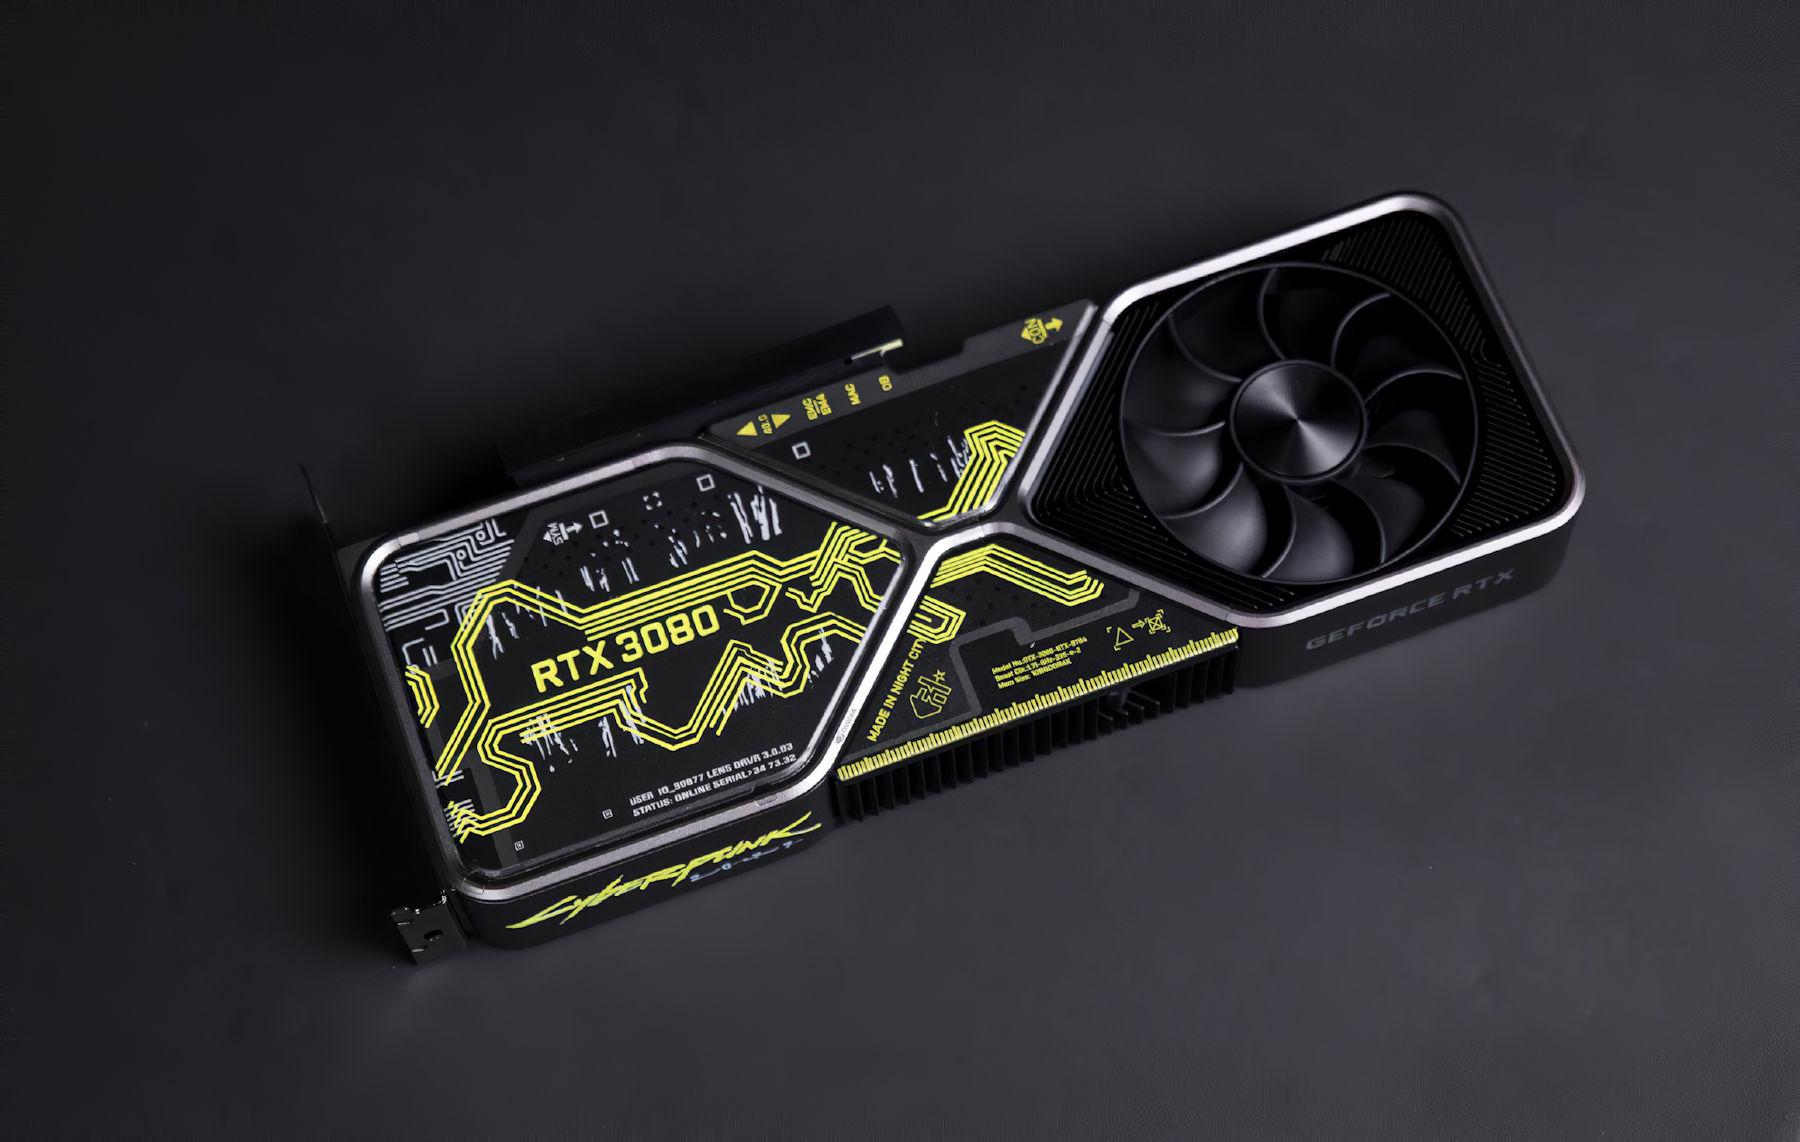 CD Projekt Red is giving away a custom NVIDIA GeForce RTX 3080 Cyberpunk 2077 Edition – VideoCardz.com